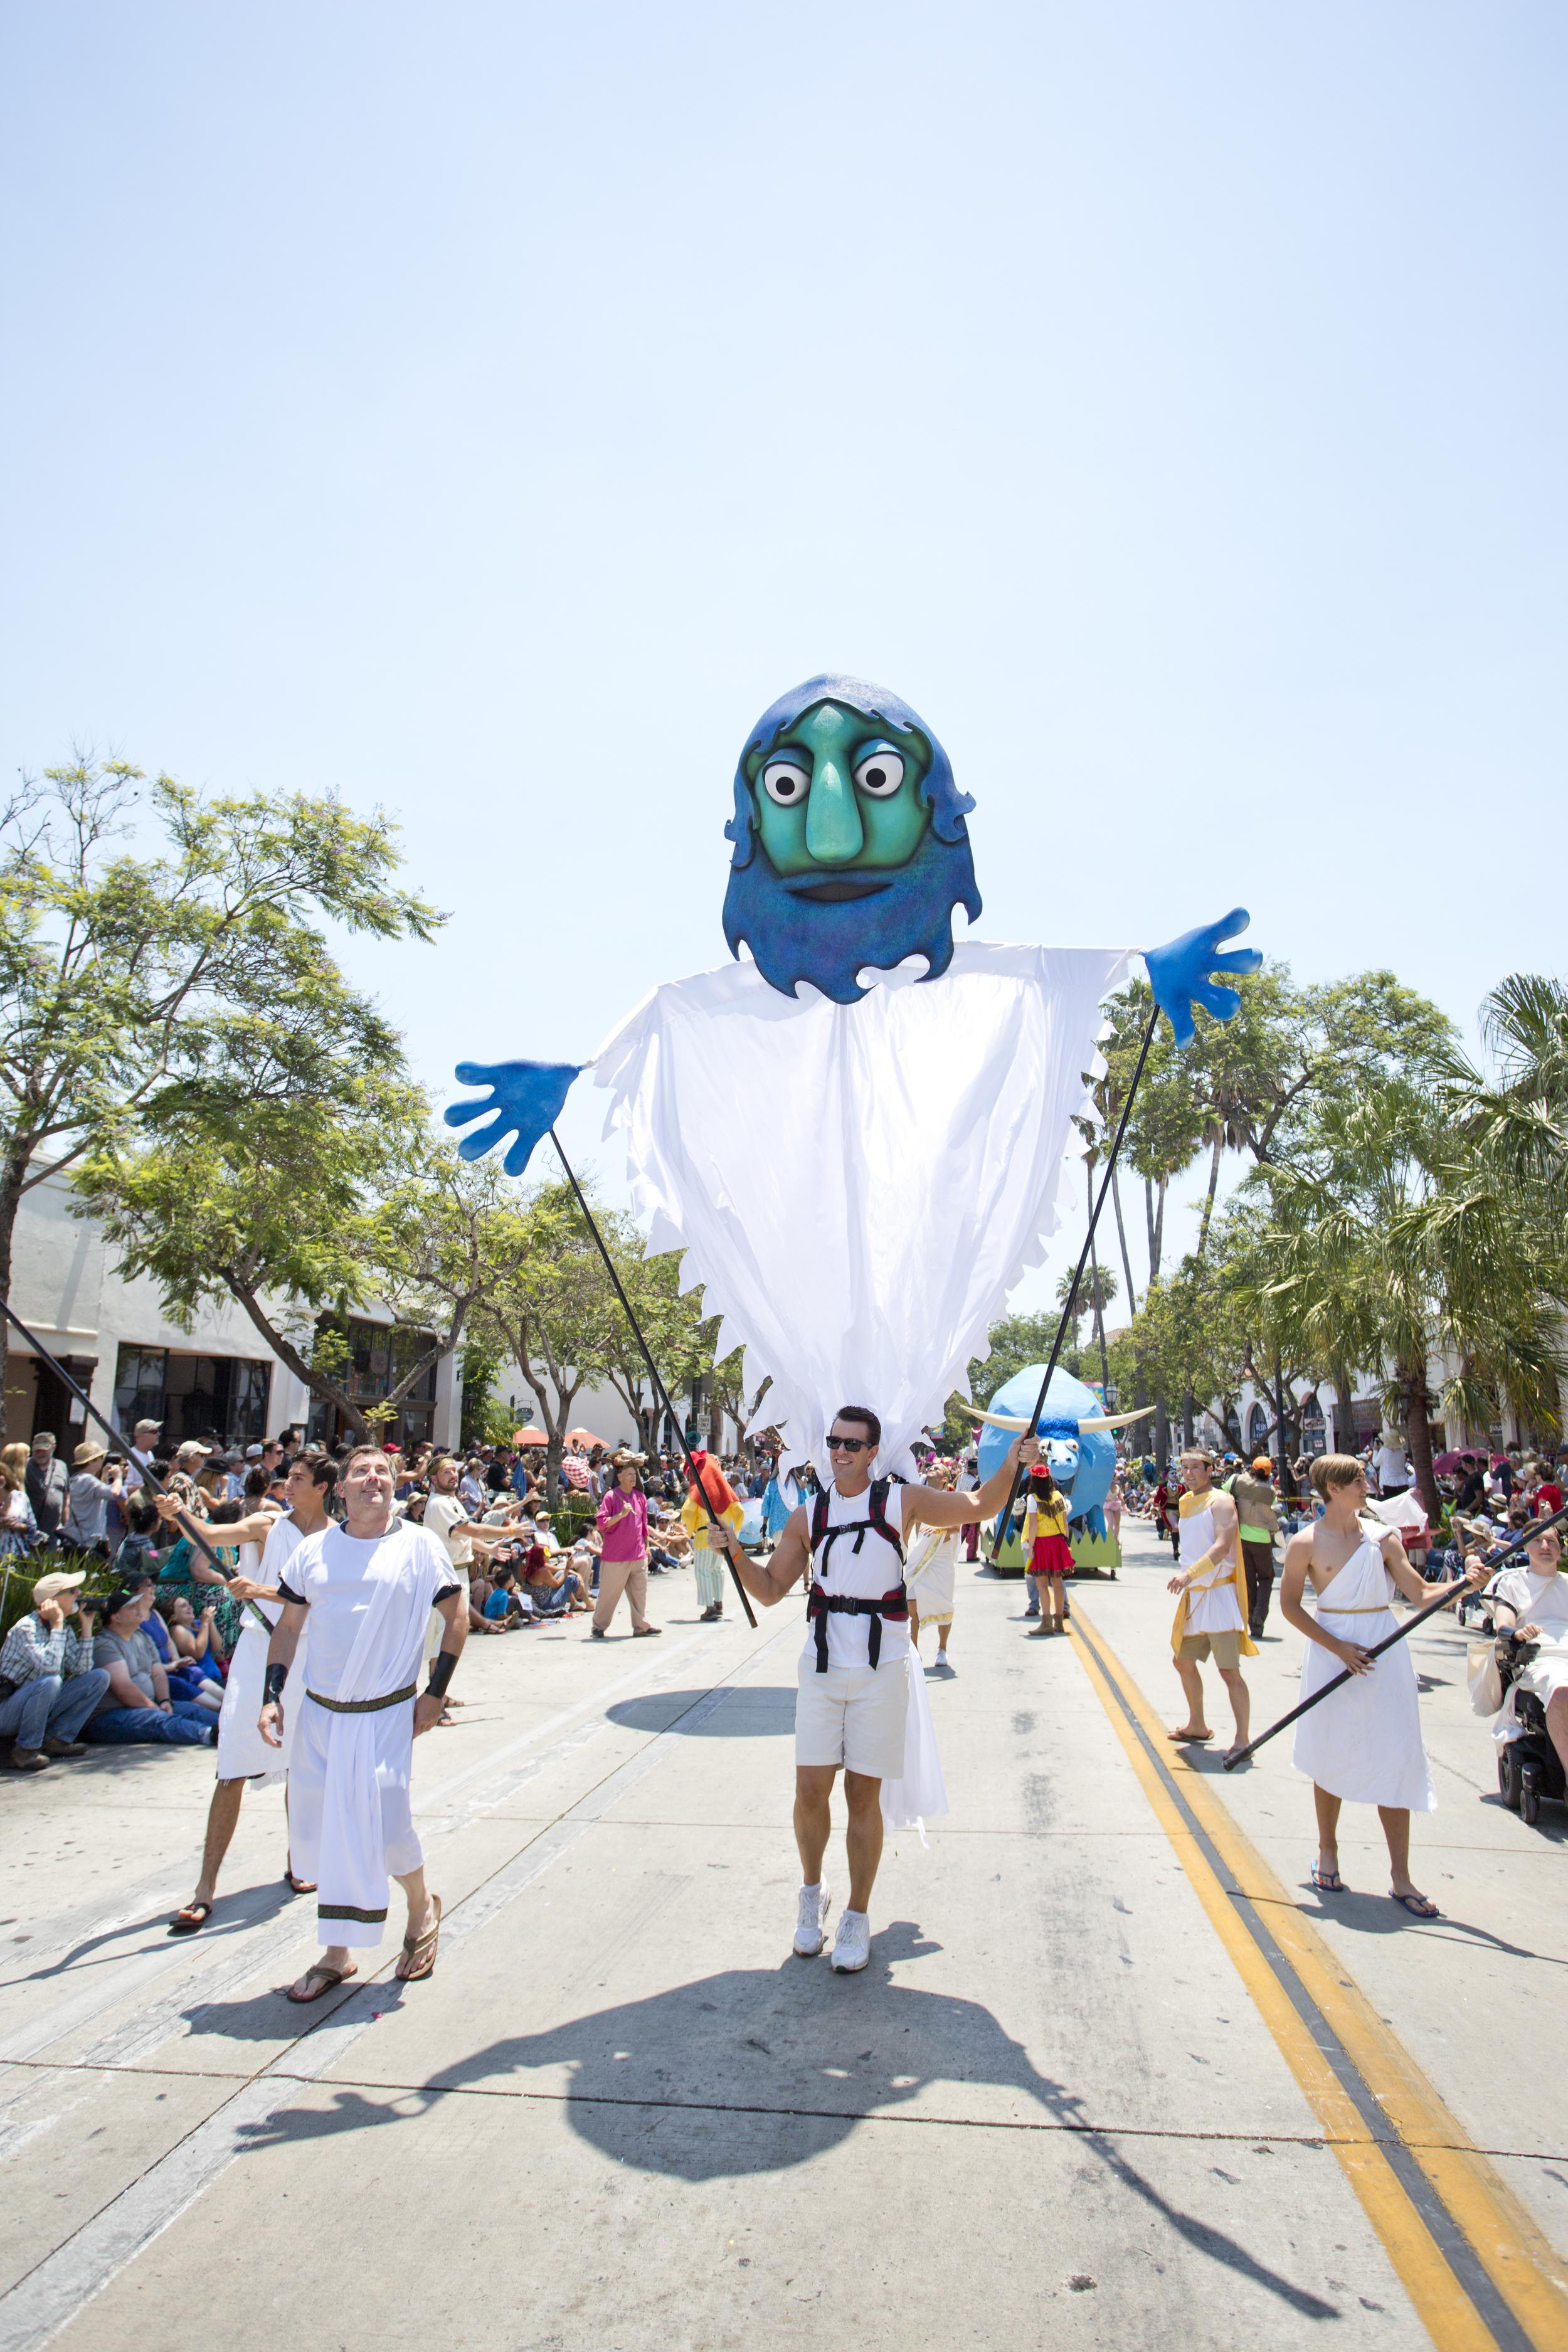 Giant Poseidon Puppet by Matthew McAvene for Santa Barbara Solstice Parade